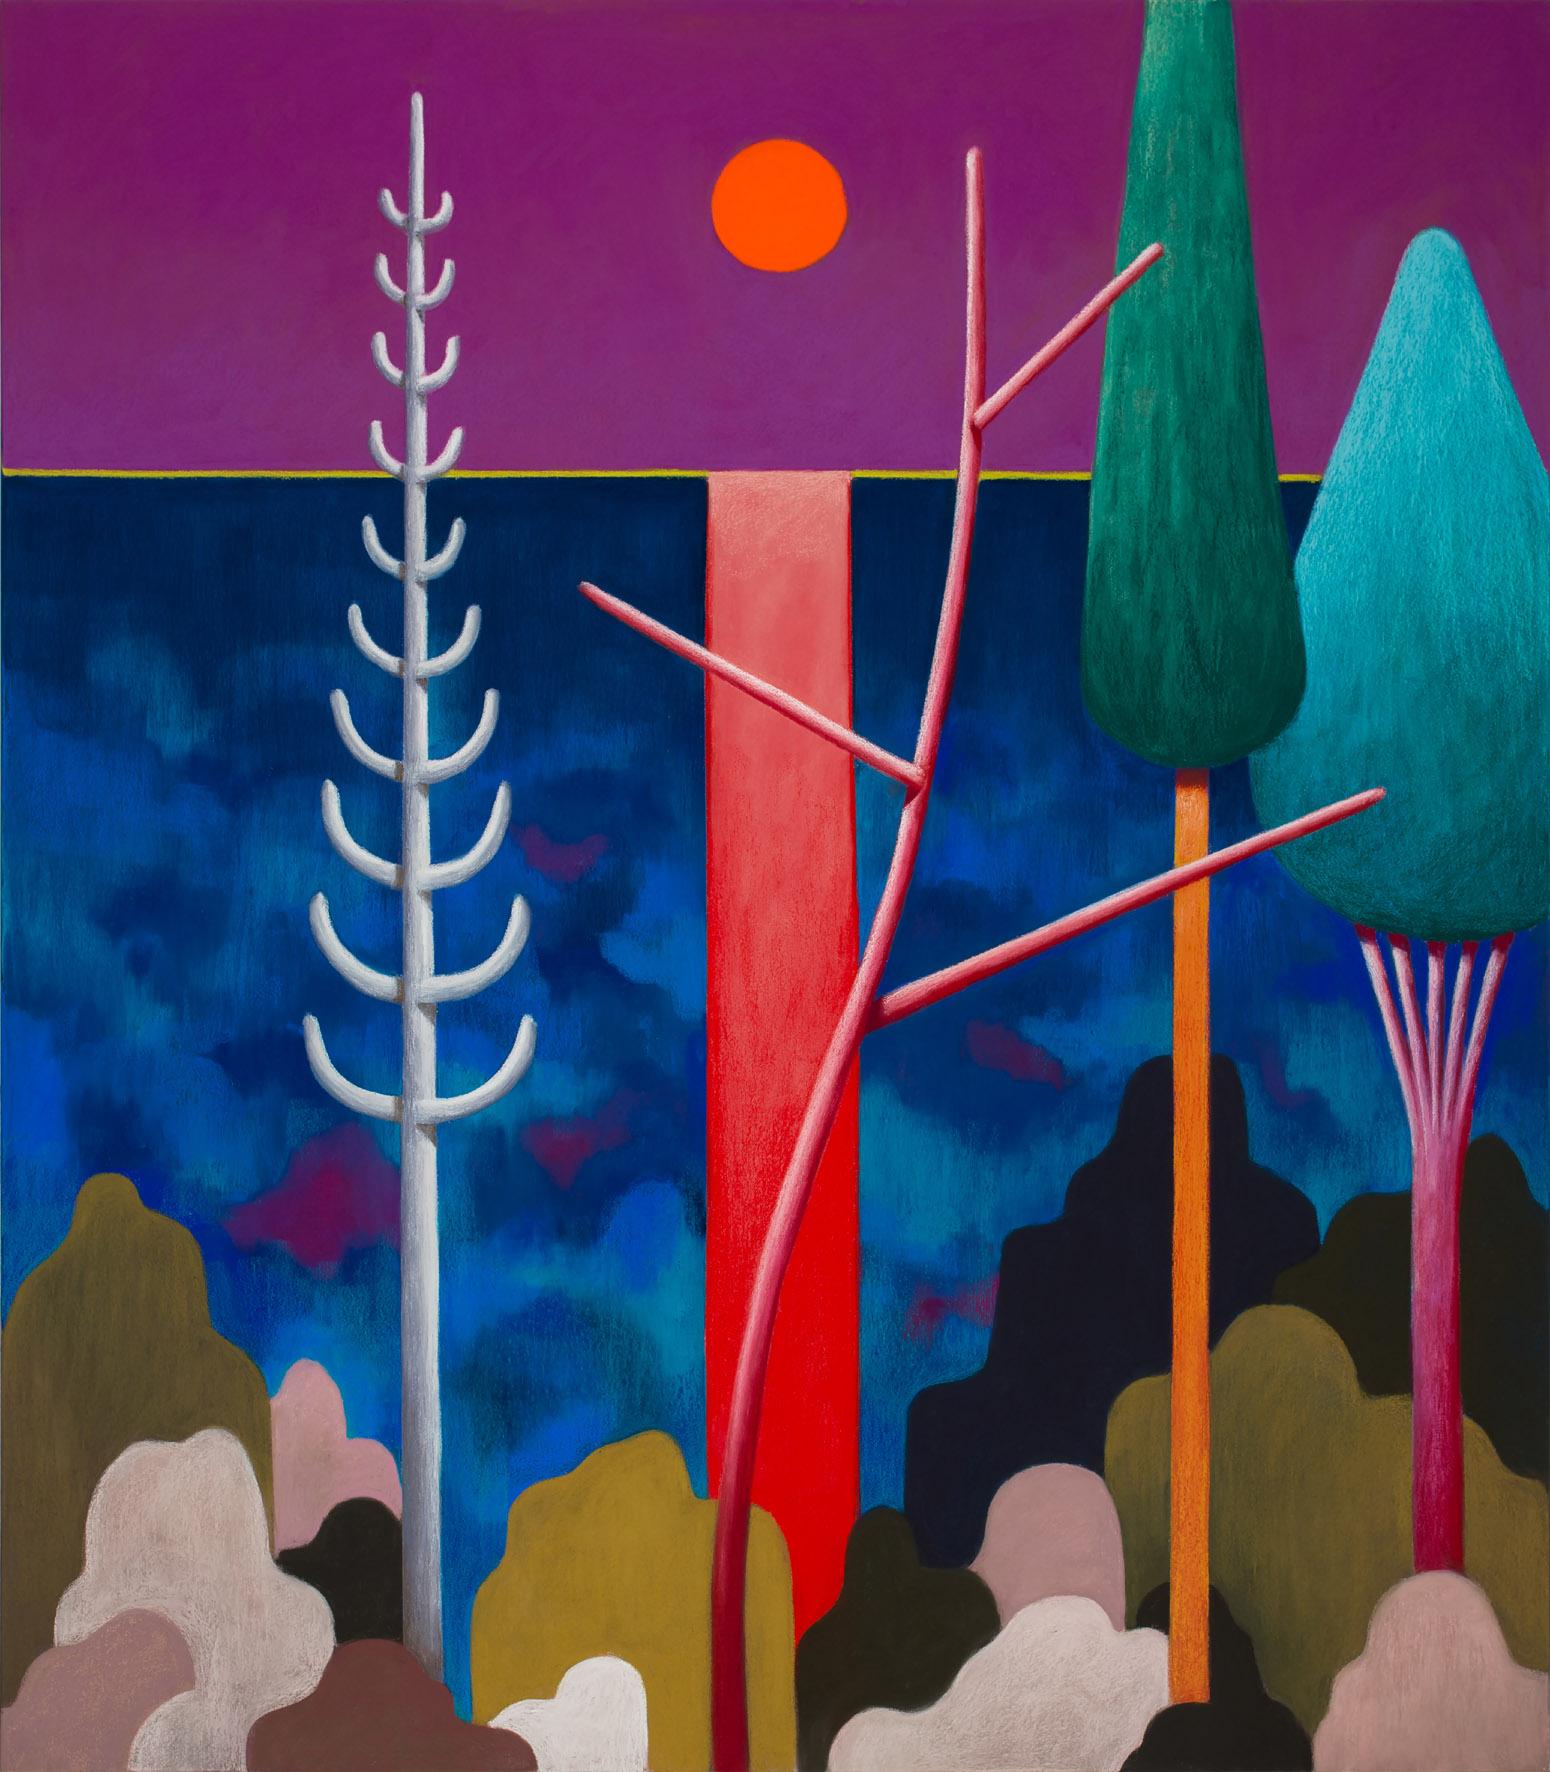 Nicolas Party Sunset, 2017  Gessetto su tela  50 x 130 cm Acquisto 2018